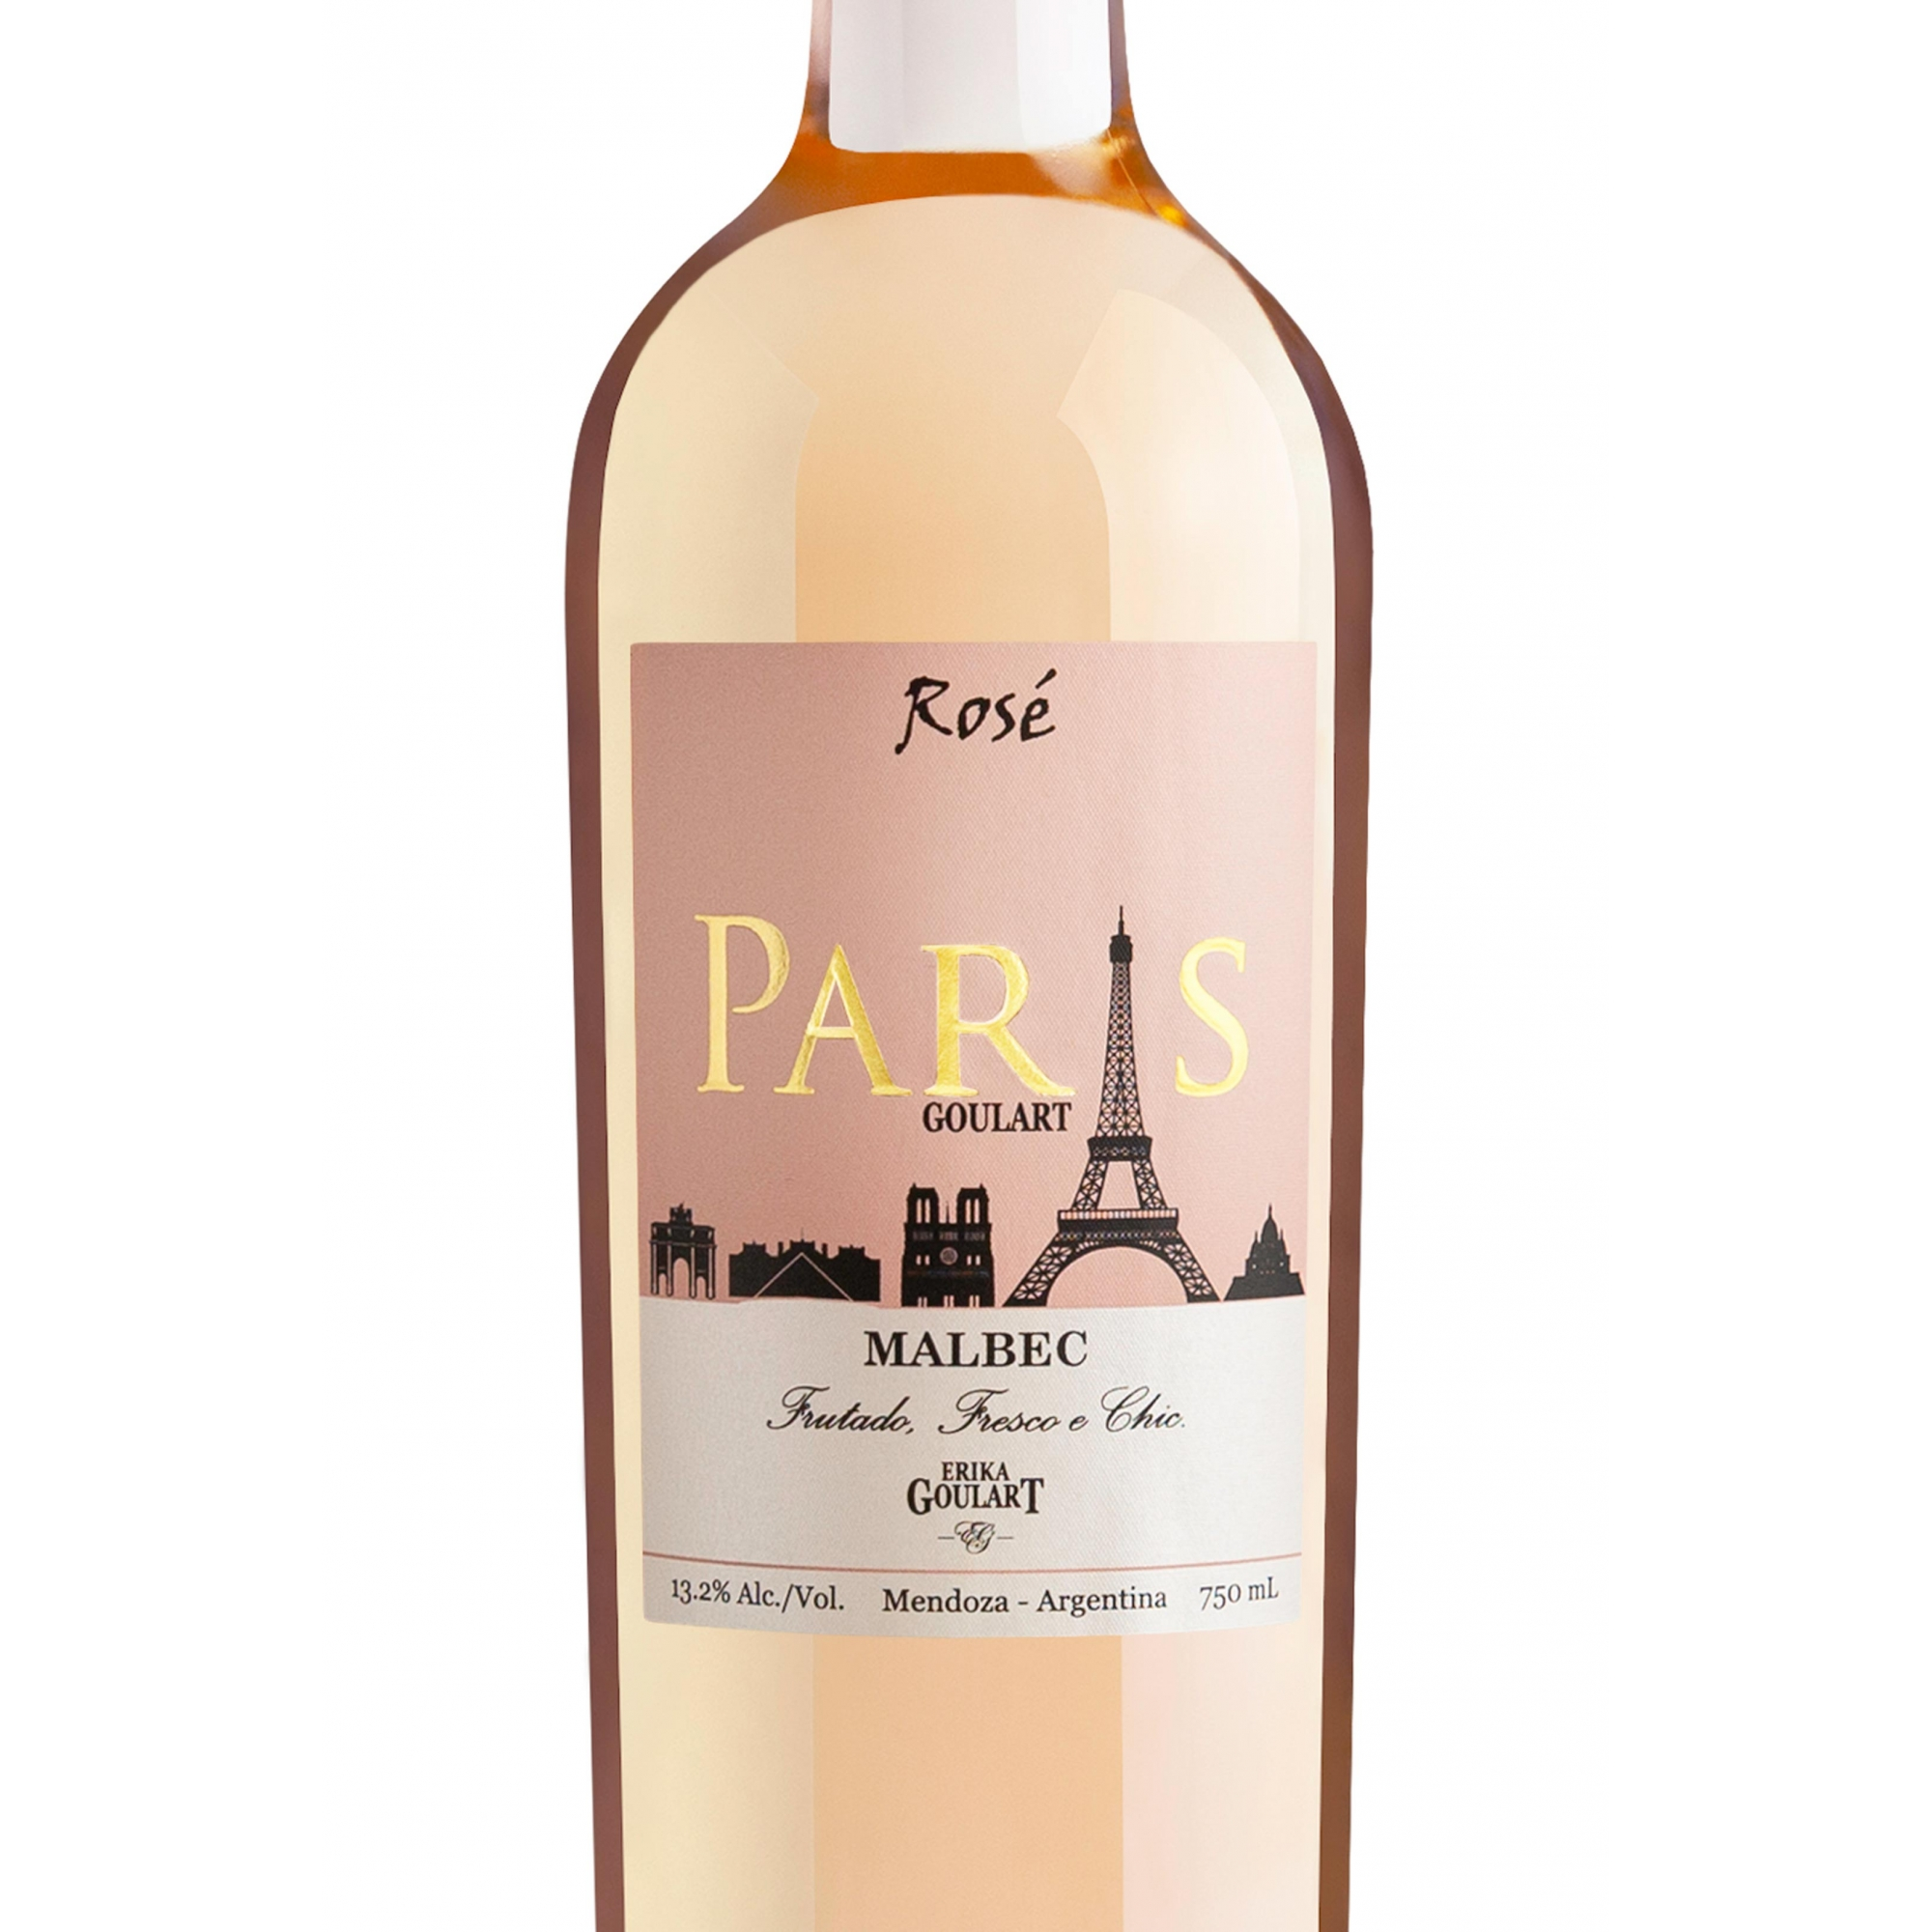 Paris Goulart Rosé Malbec 2020 - 750ml